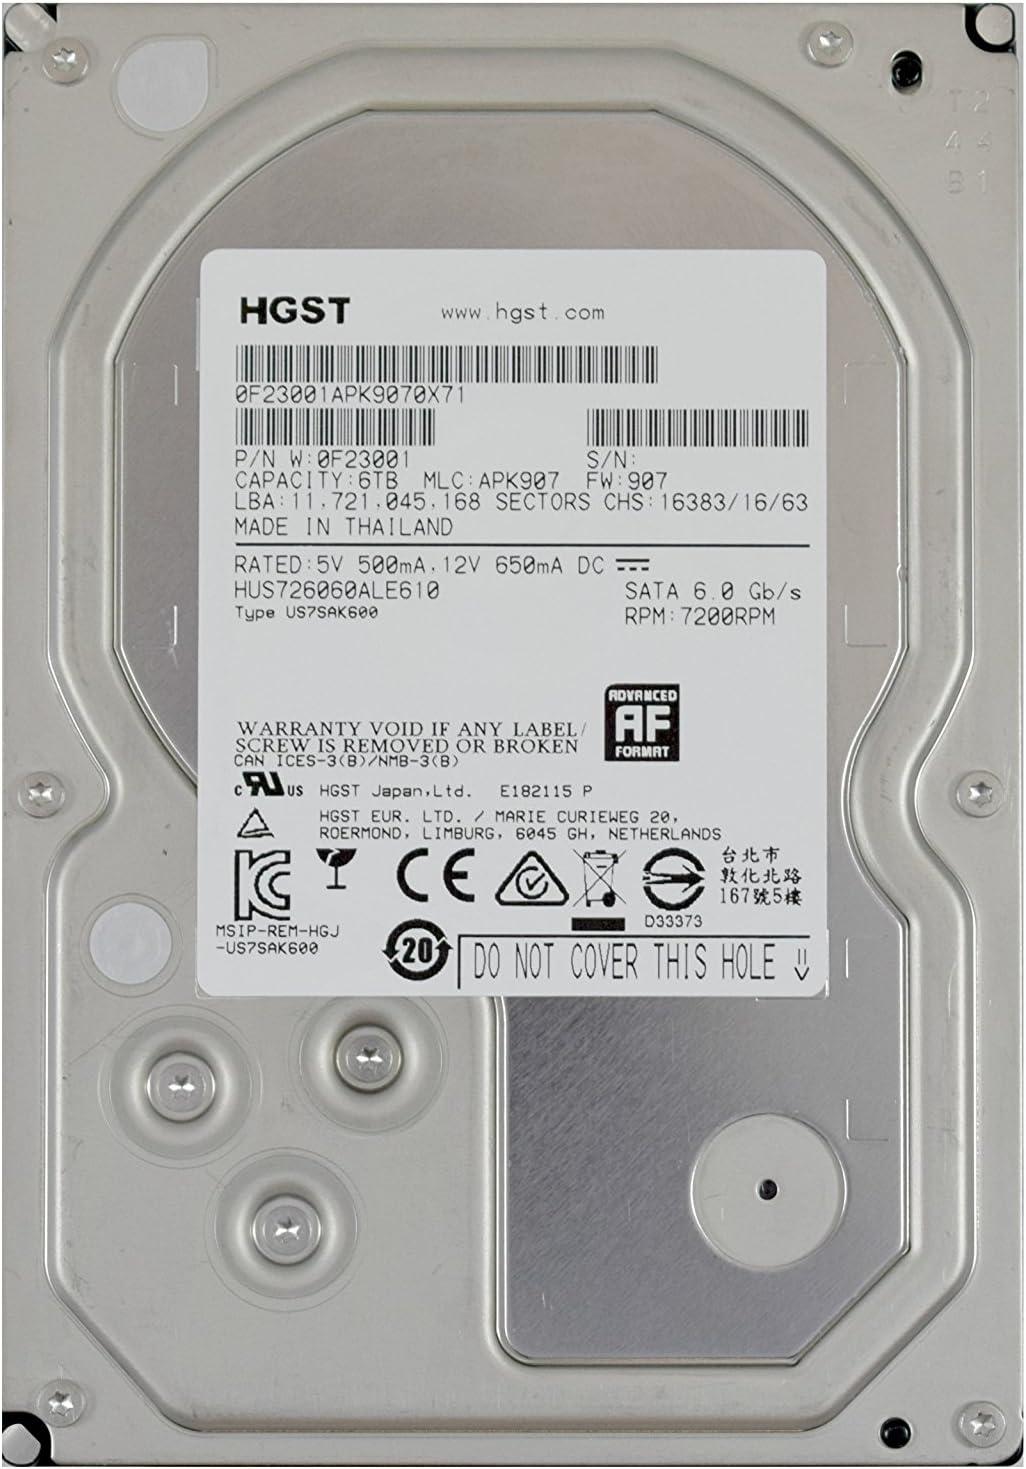 HUS726060ALE610 HGST 6TB SATAIII 128MB RAID, ENTERPRISE ULTRASTAR 7K6000 RAID 24x7 RAID ENTERPRISE